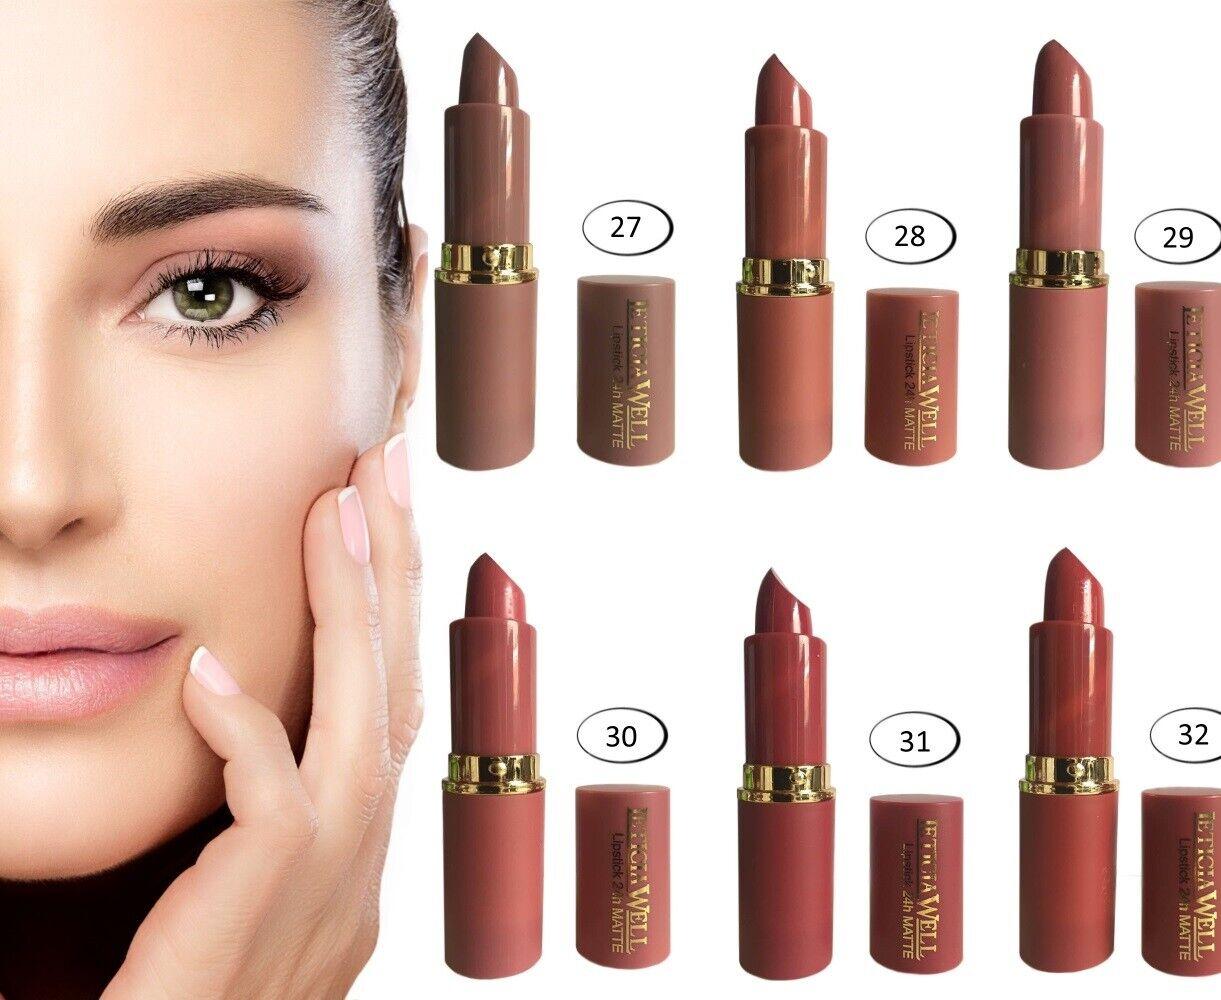 Lippenstift Matt 24h  Lipstick Braun Töne Lippenpflege Kosmetik Matter Lipliner1